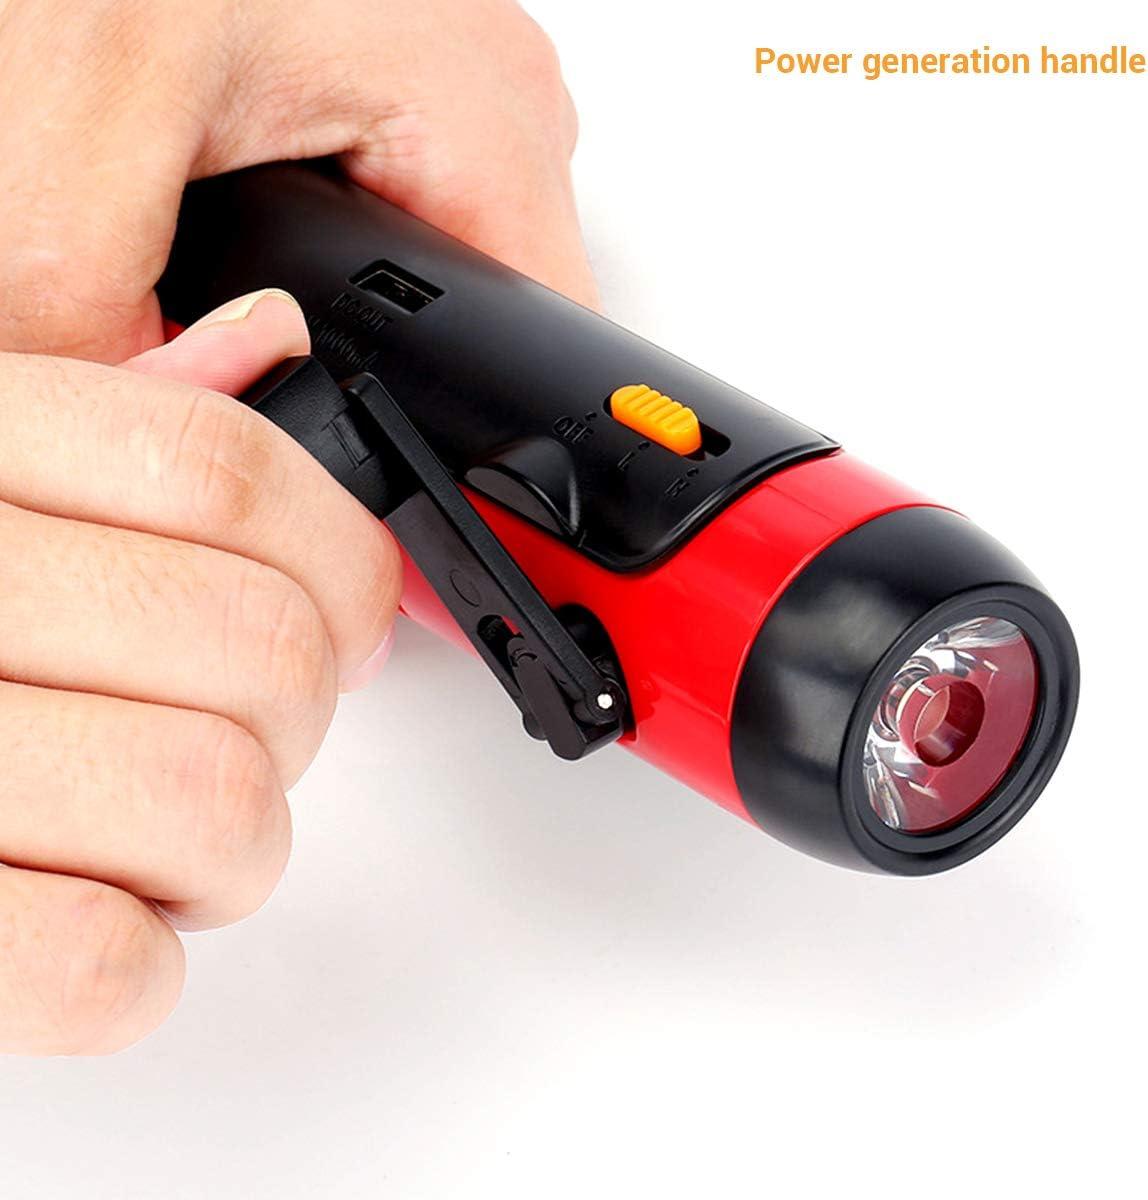 SOS-Alarm AM//FM Radio USB Powerbank f/ür Wandern Camping Notf/älle Haus und im Freien Notfallradio LED Taschenlampe mit Kurbelgriff